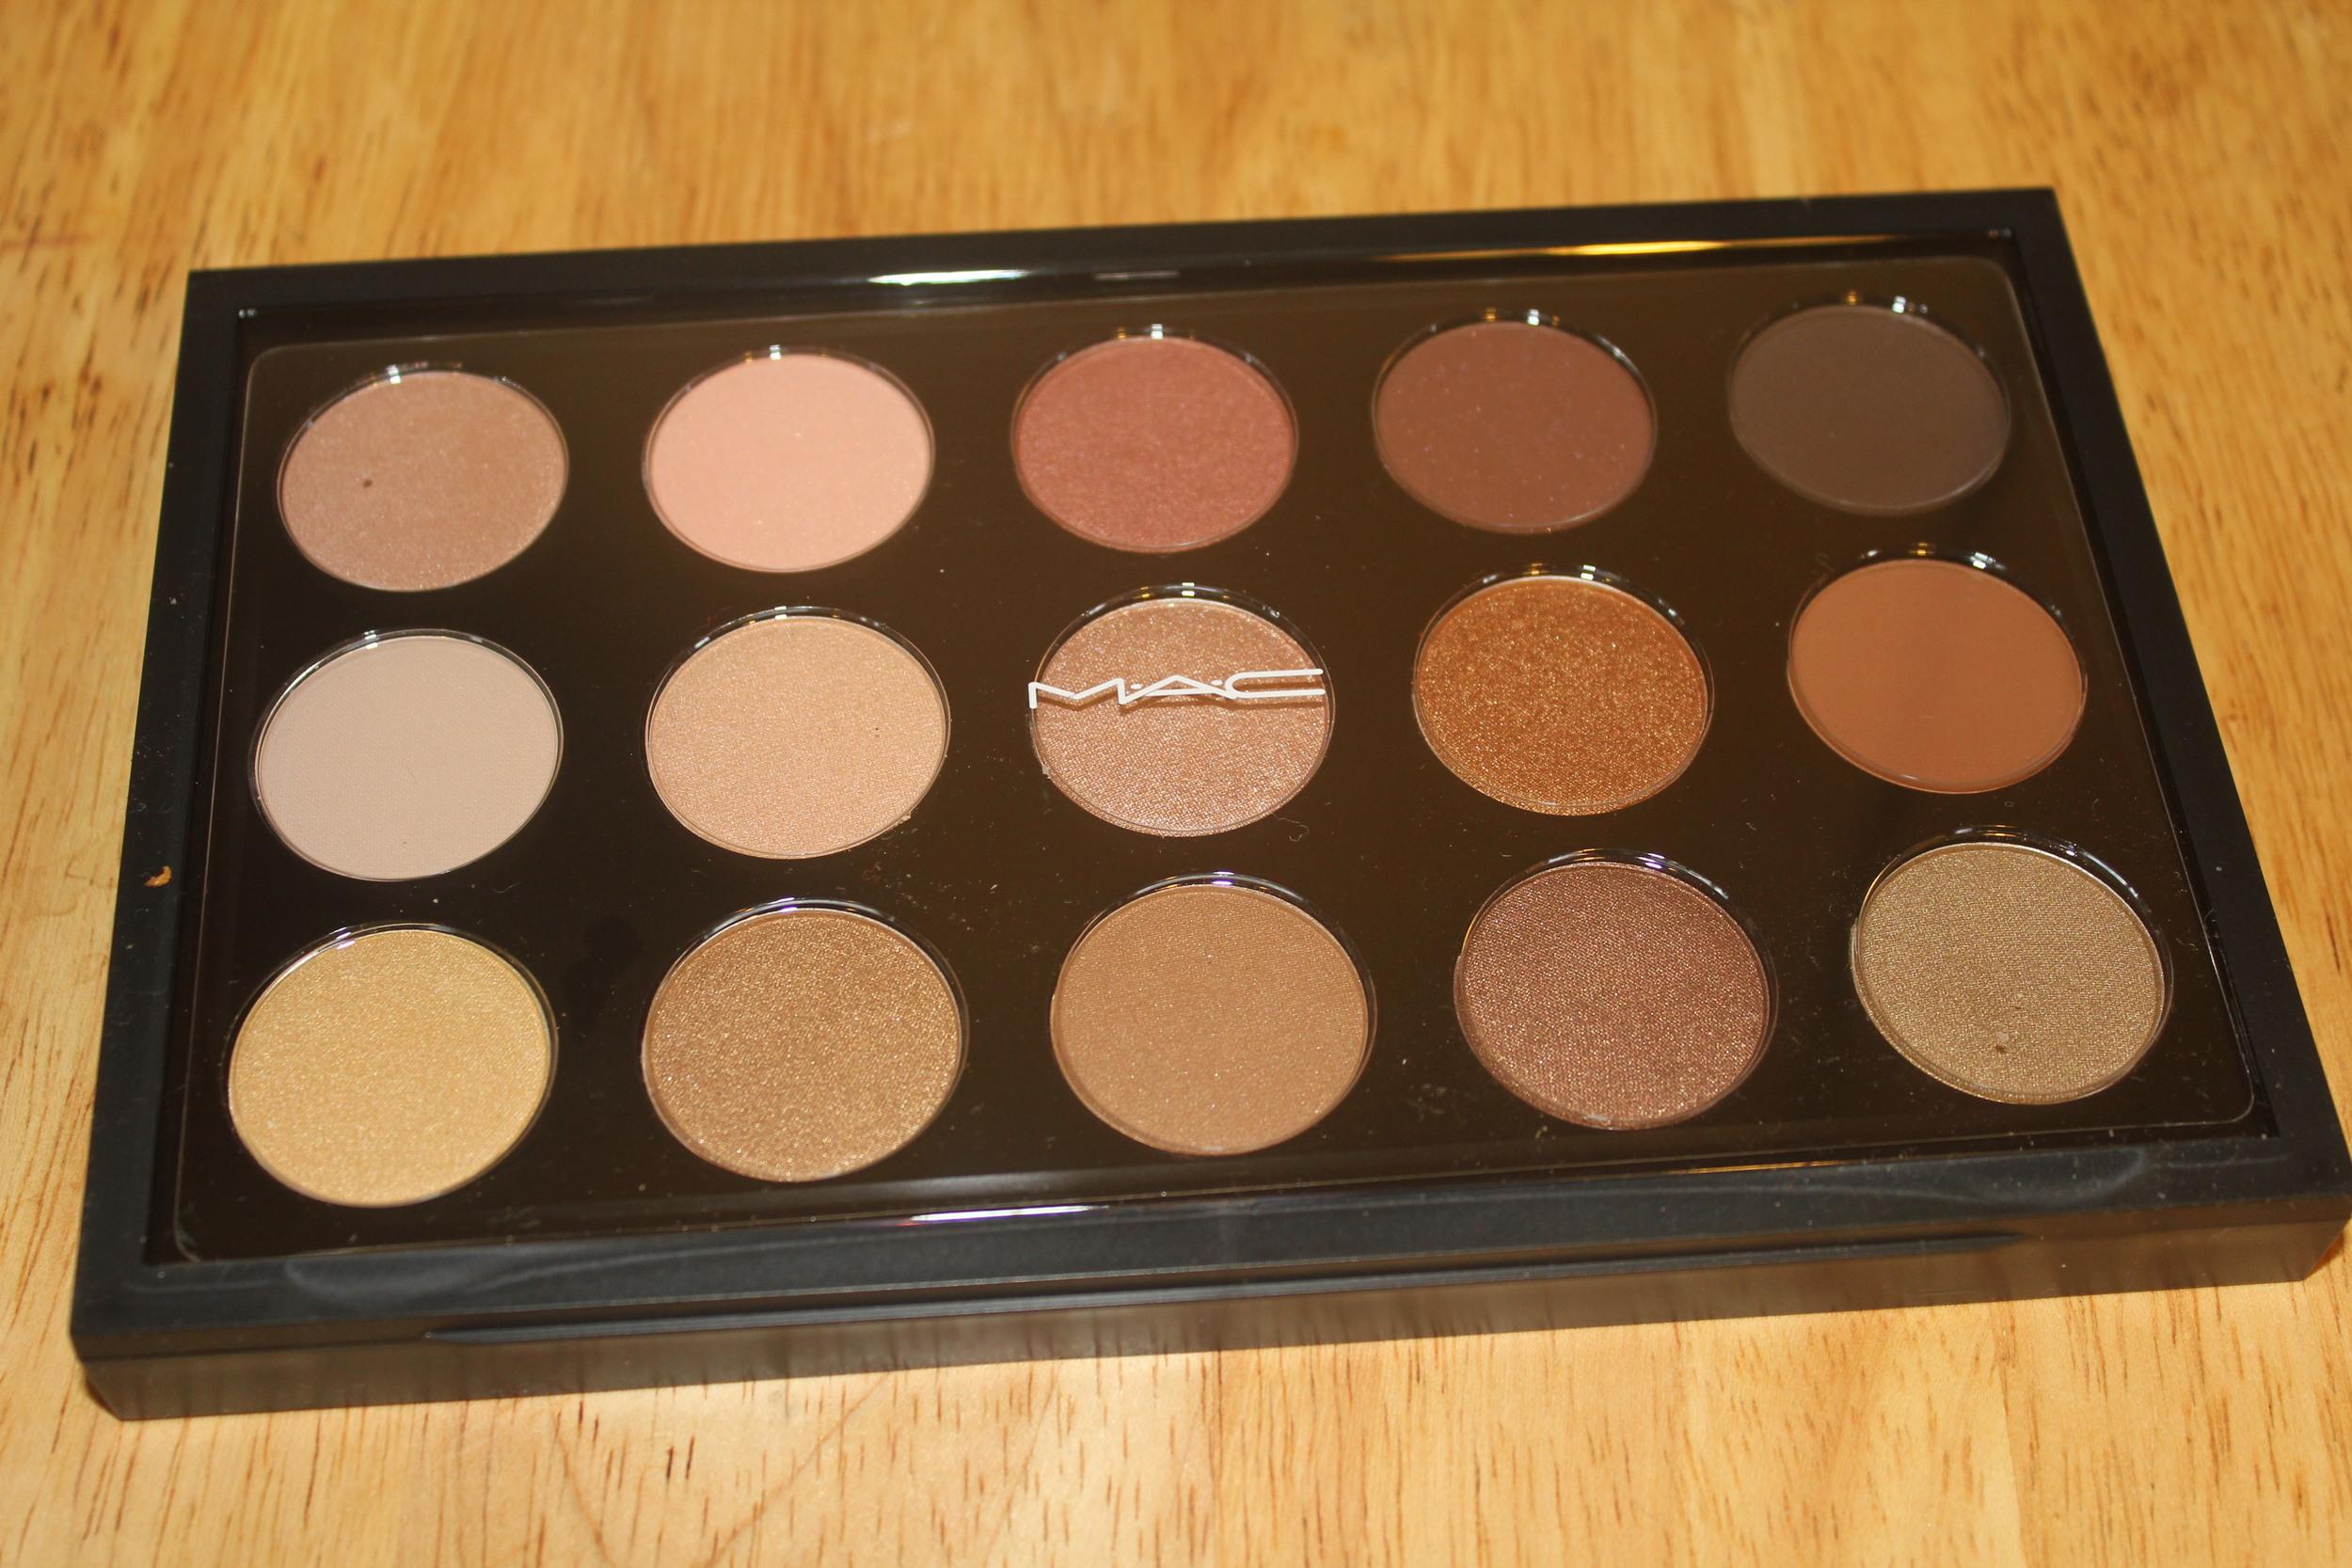 Warm Neutral Palette by MAC Cosmetics